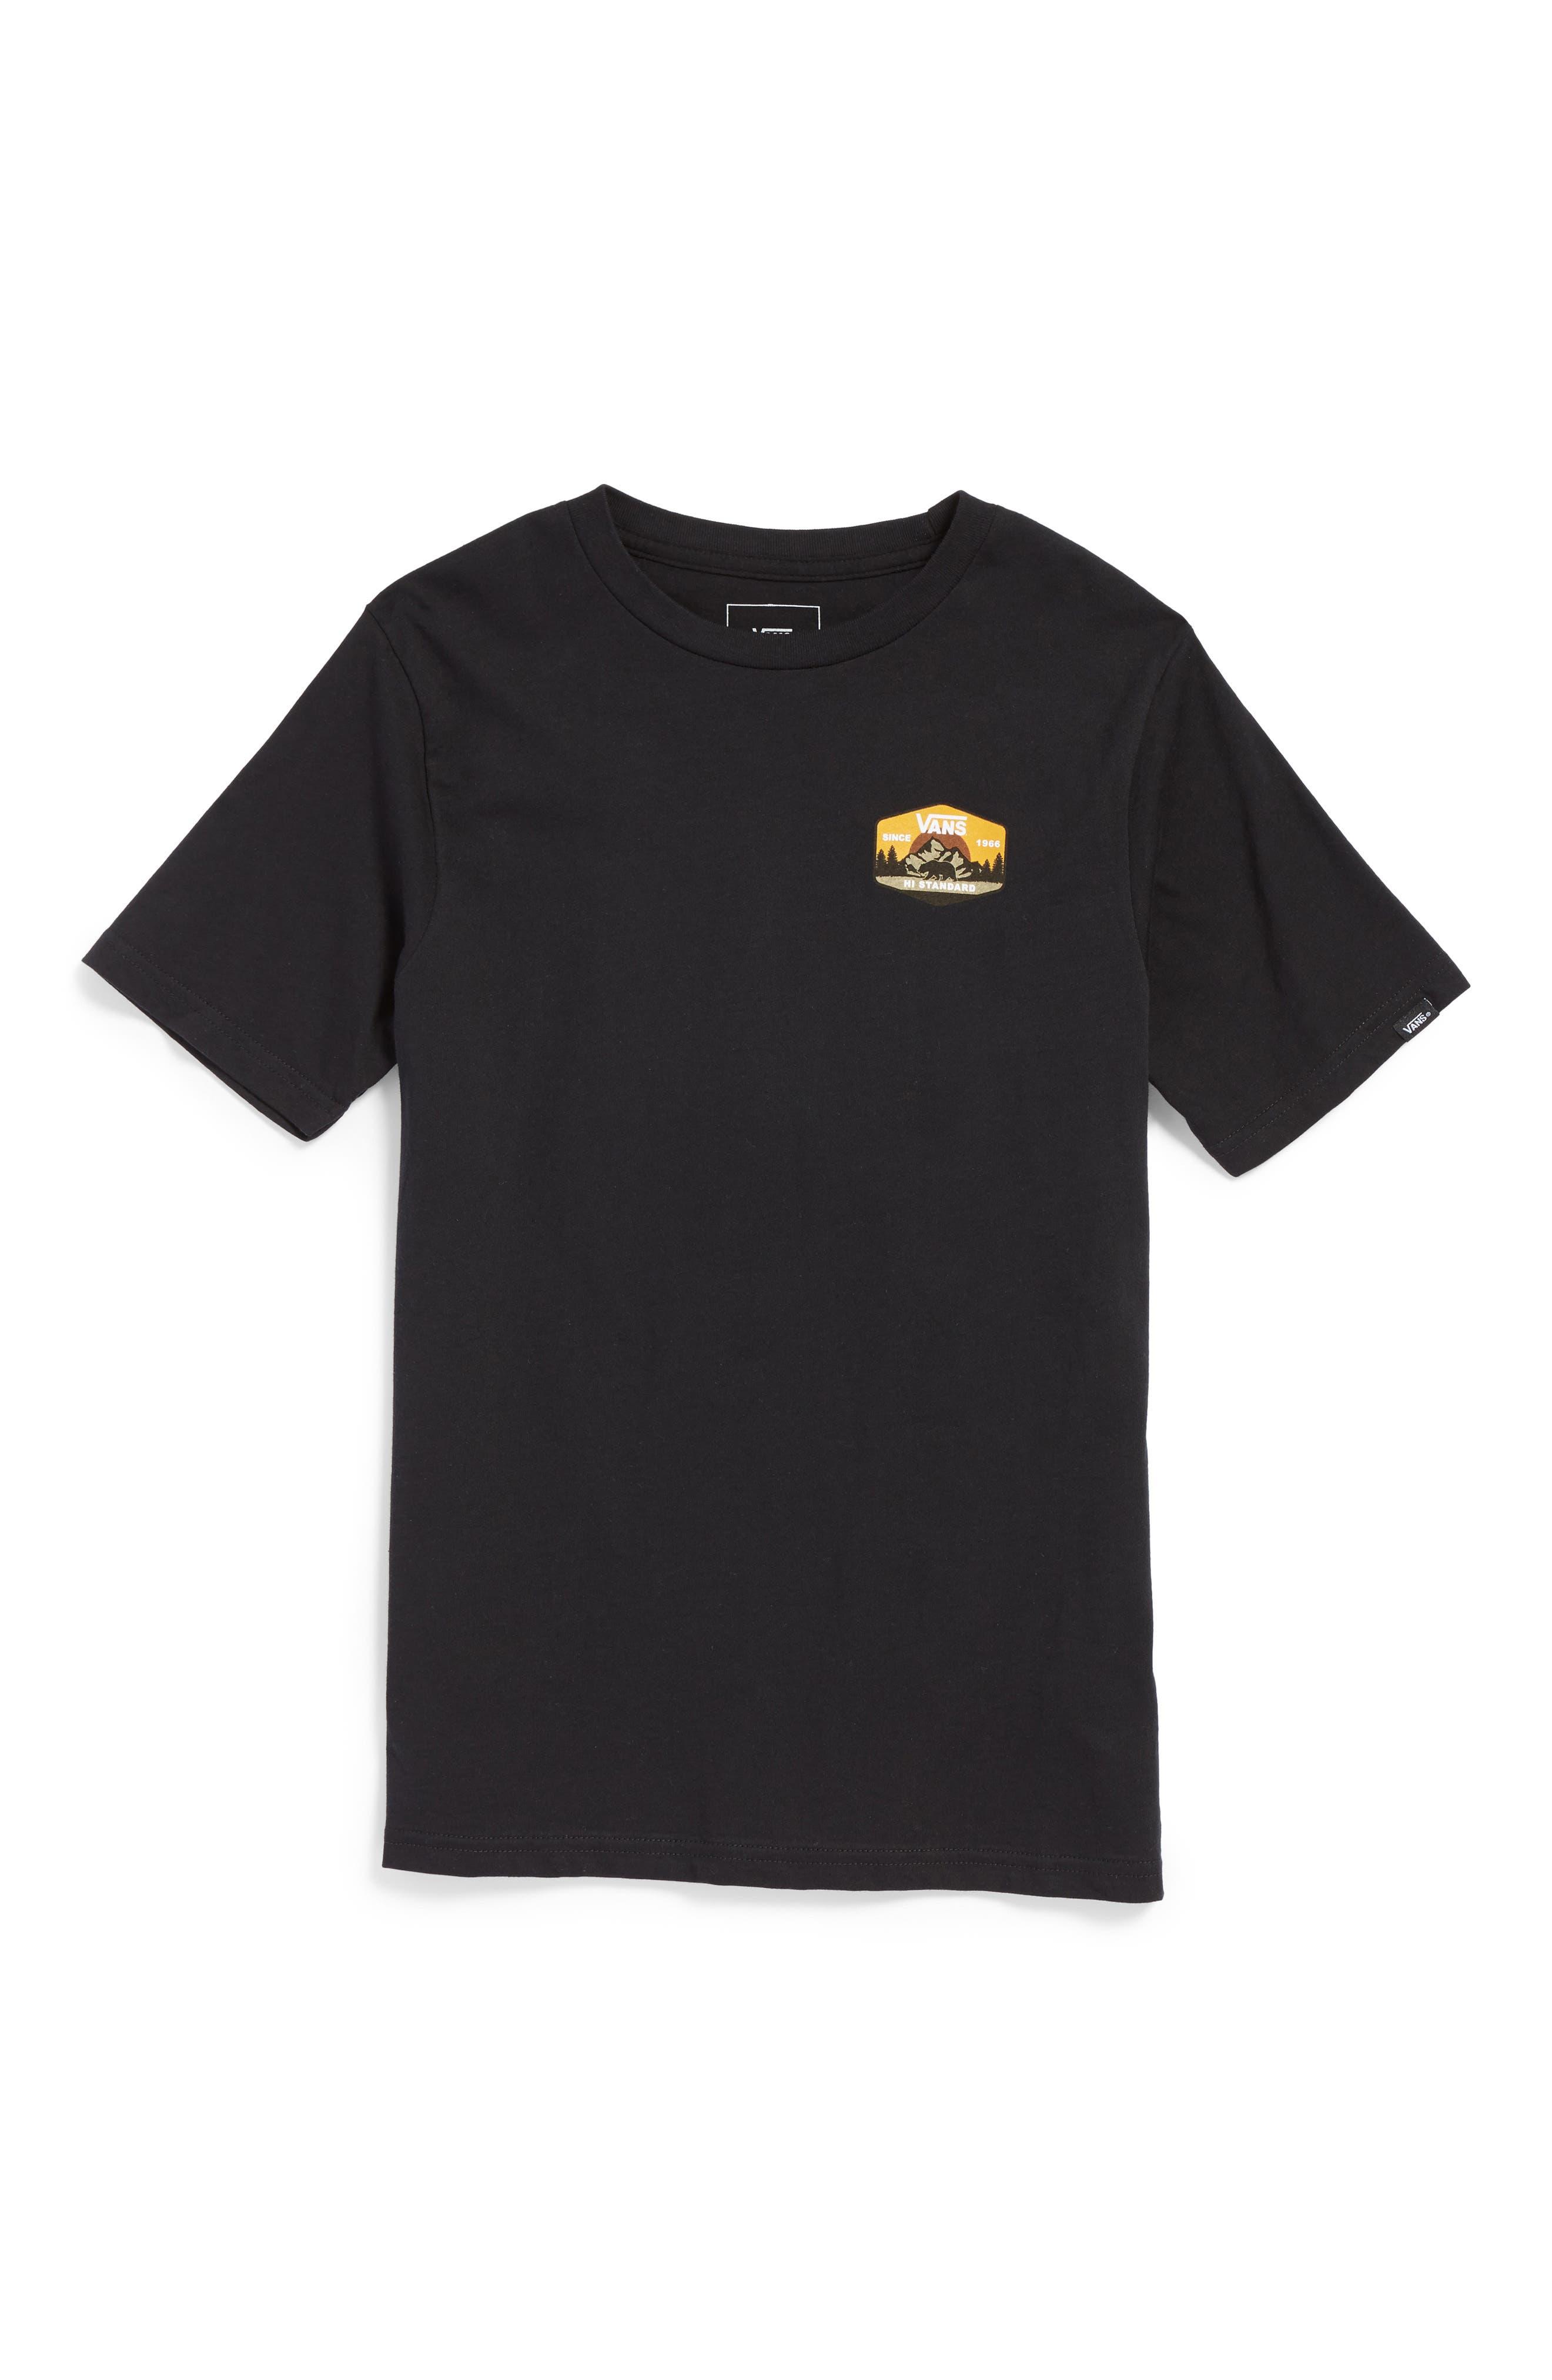 Alternate Image 1 Selected - Vans Mountain Hi-Standard T-Shirt (Big Boys)